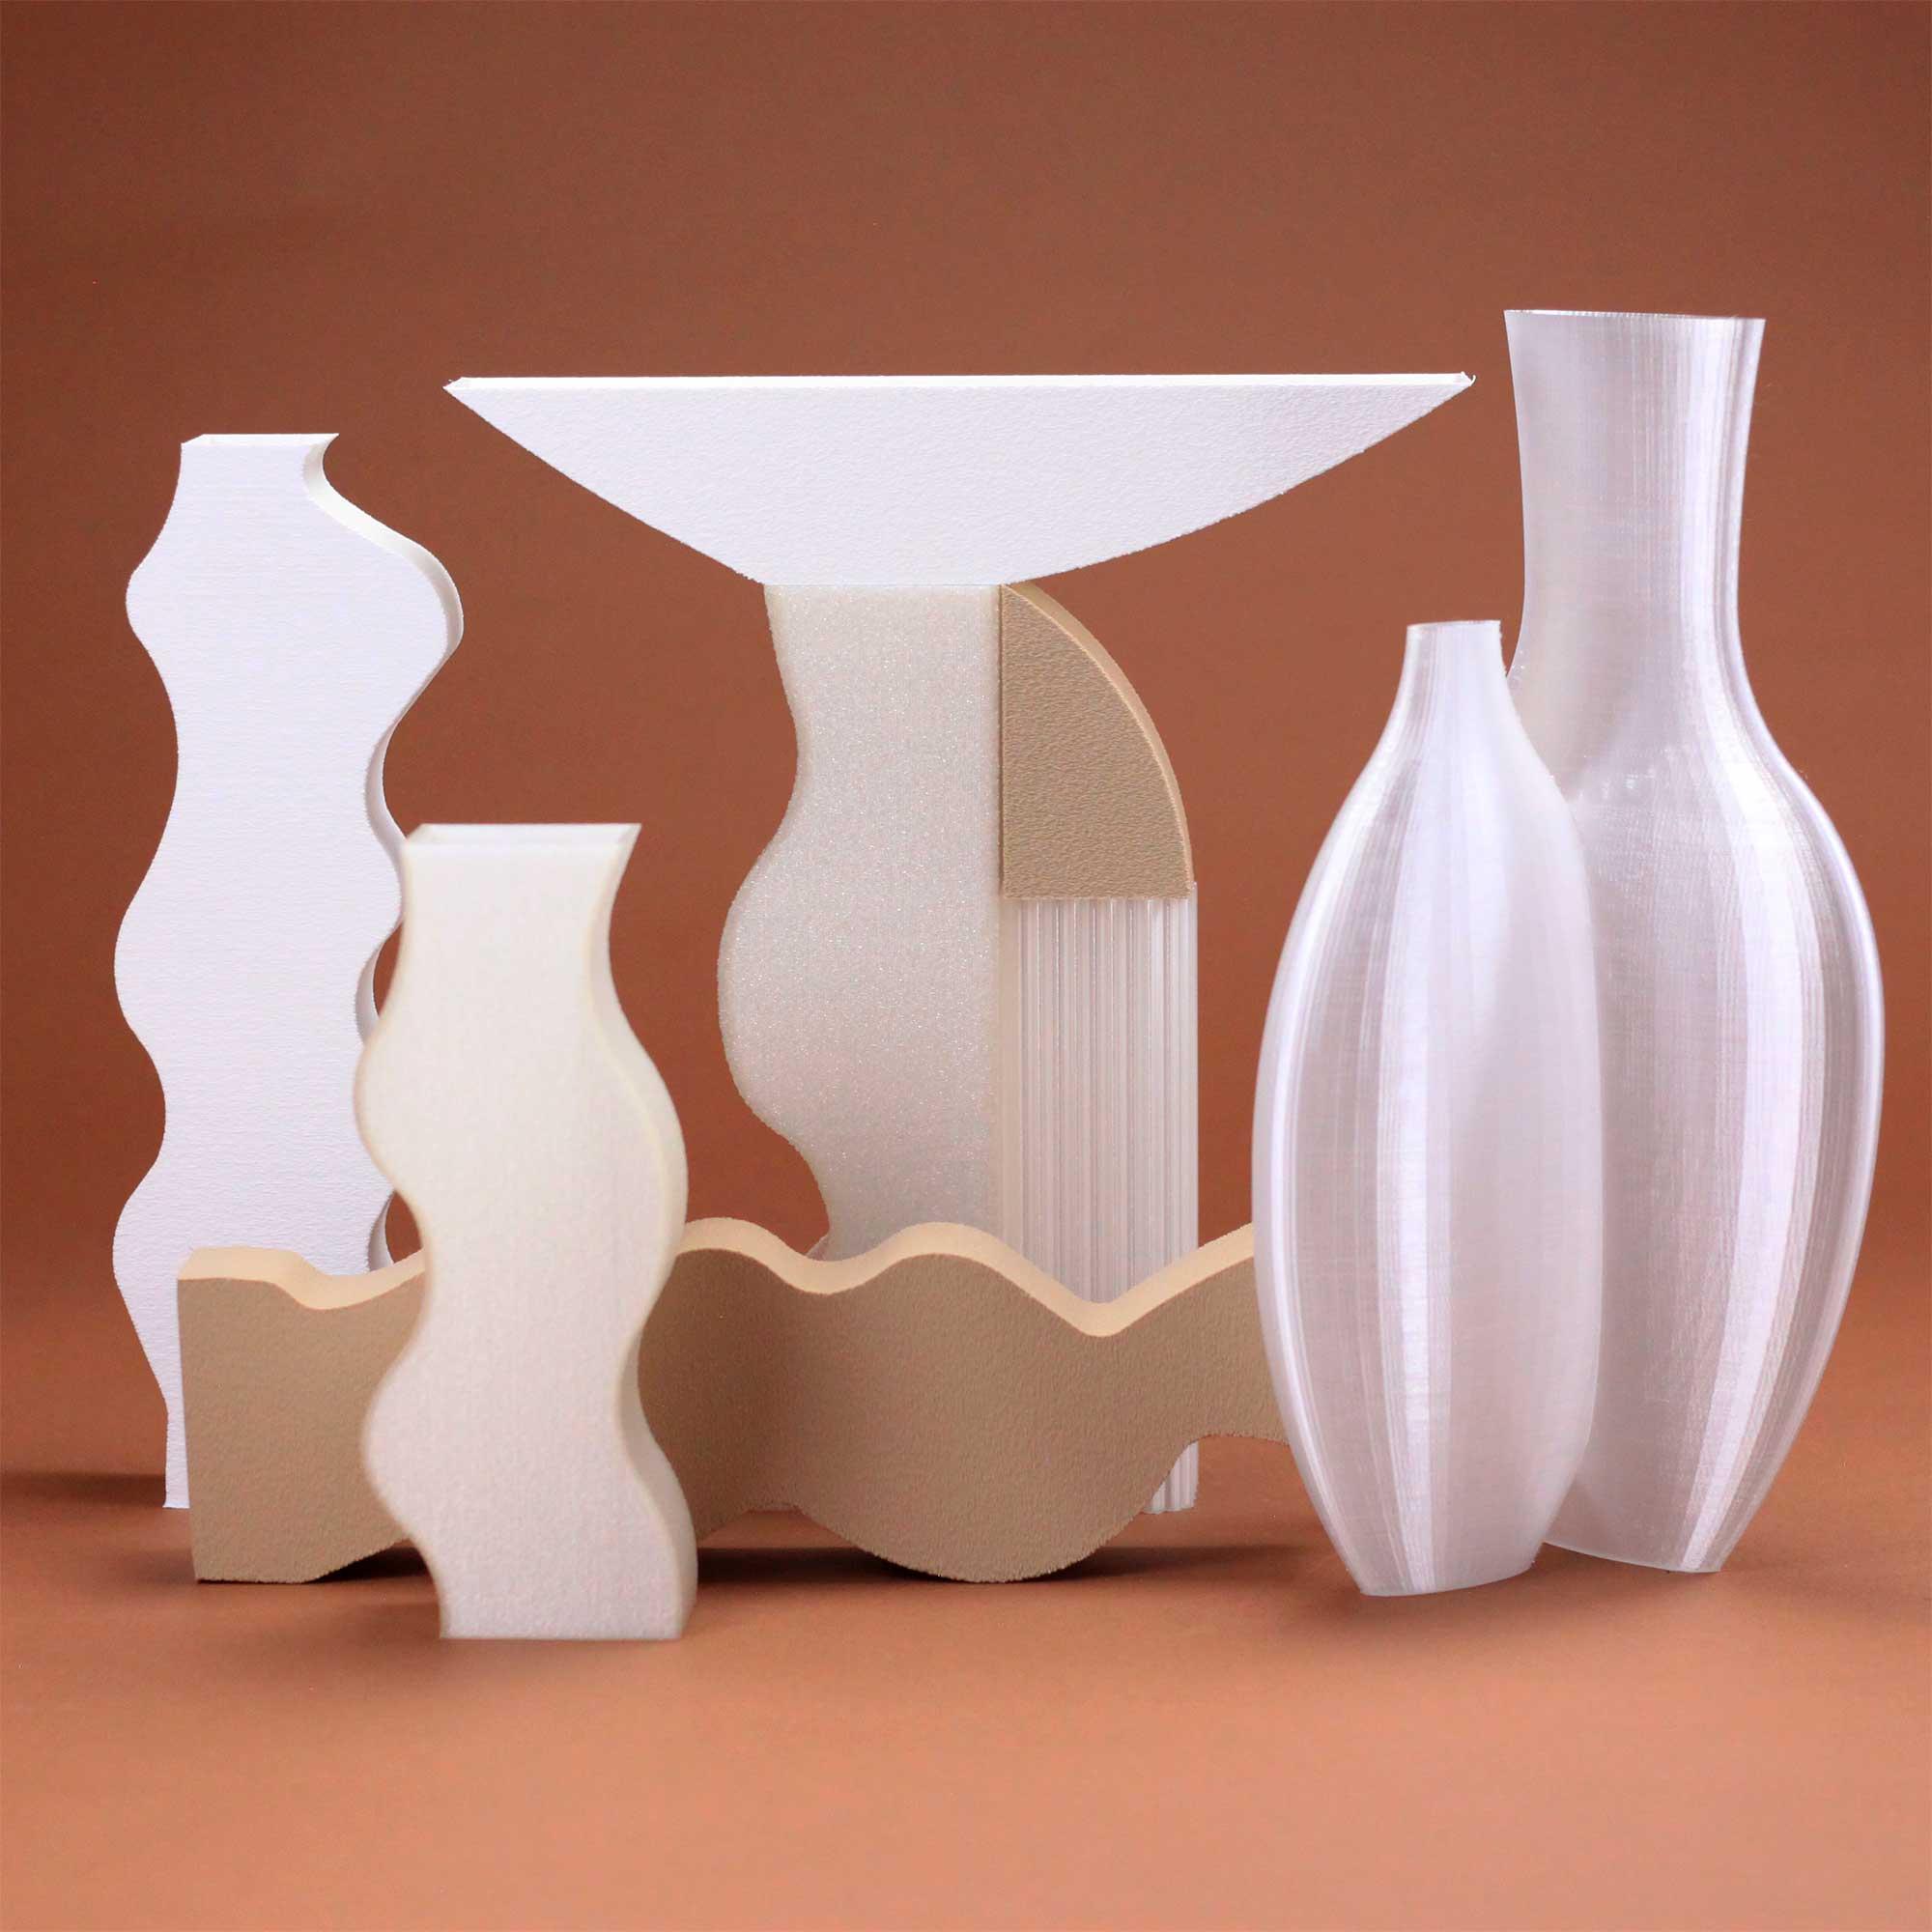 Argot Studio artwork gallery 3D vases Cool Machine store